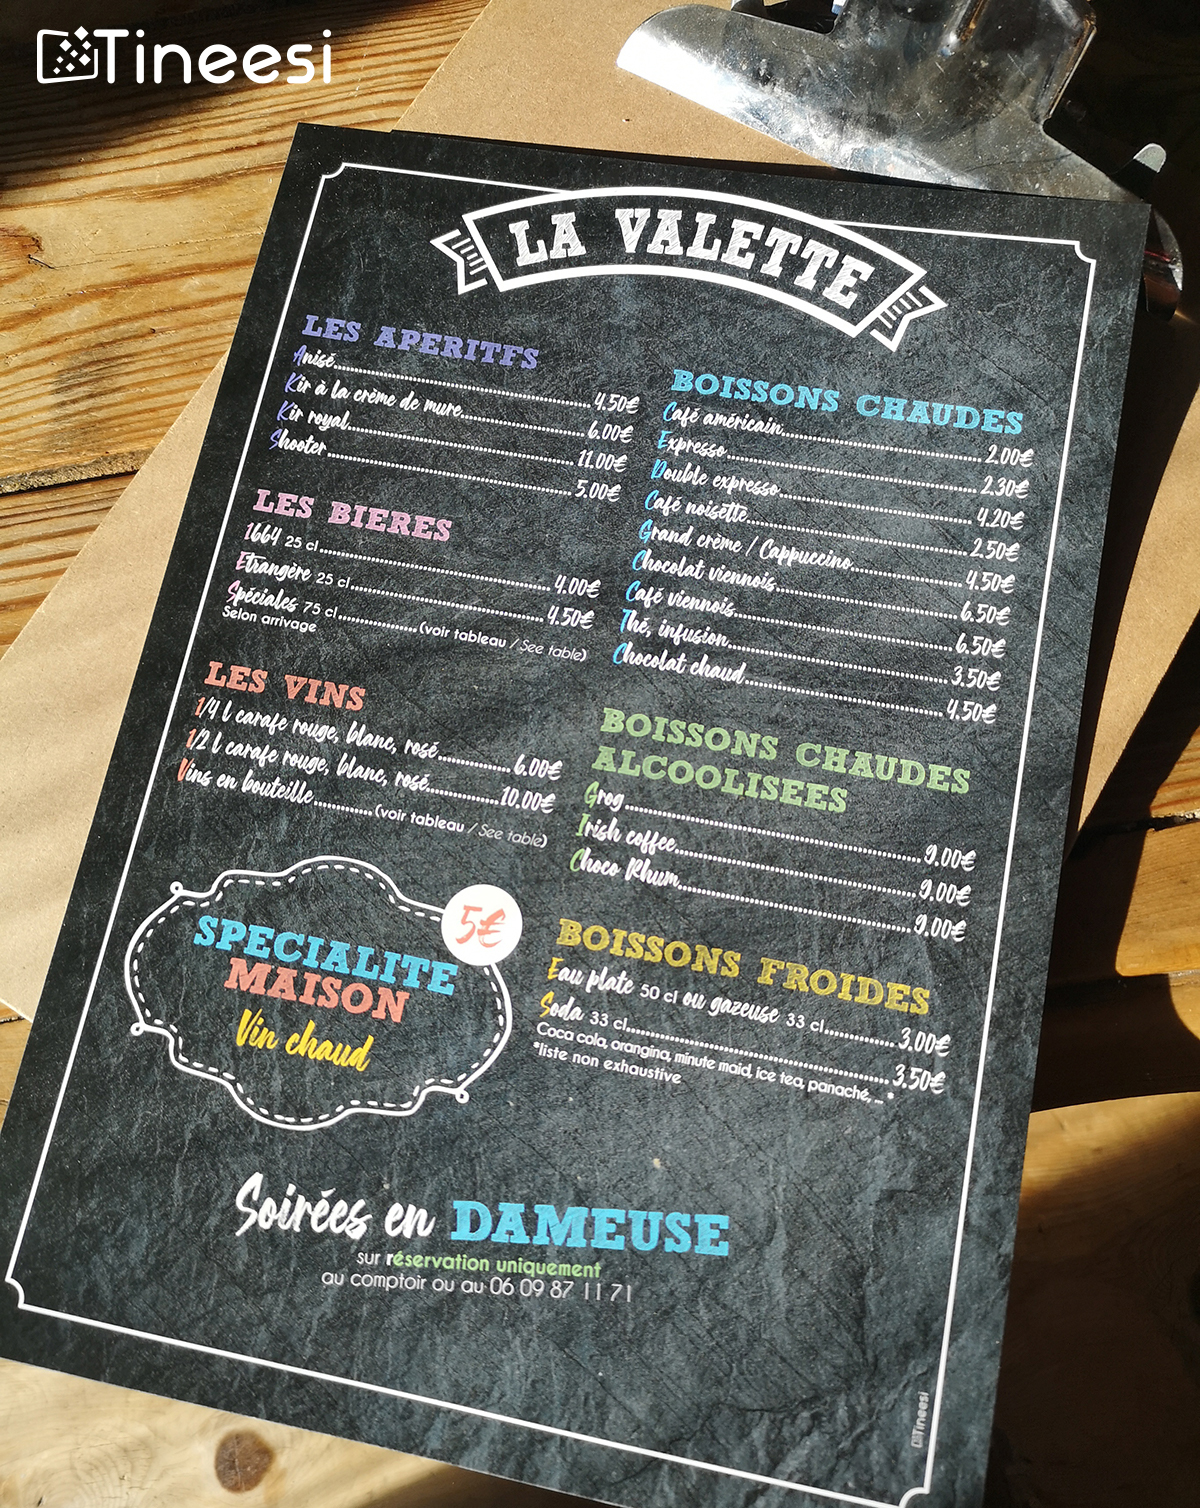 Restaurant La Valette Menu